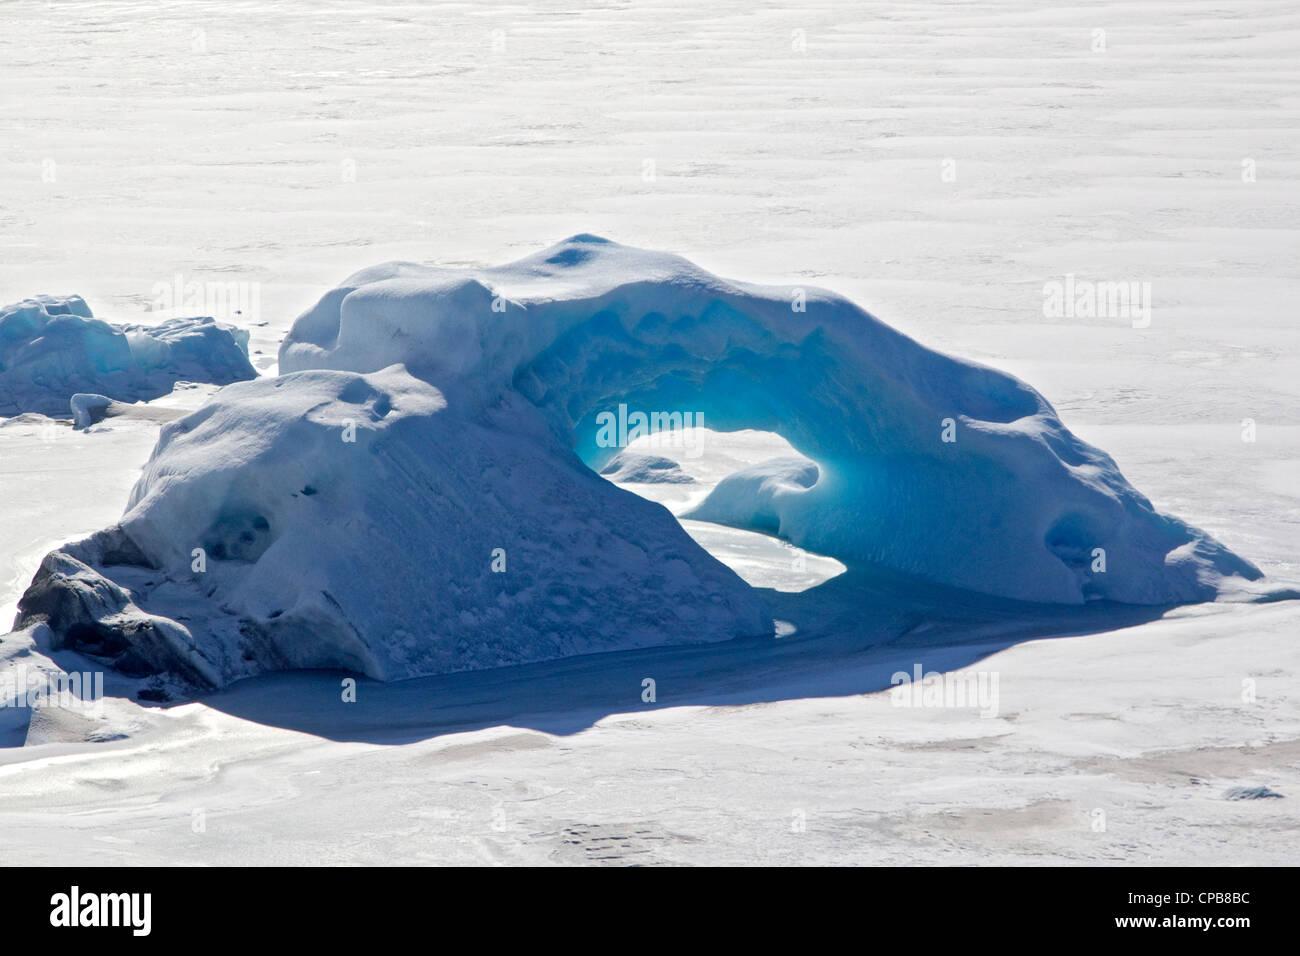 Frozen blue ice arch on glacier, Alaska, USA - Stock Image